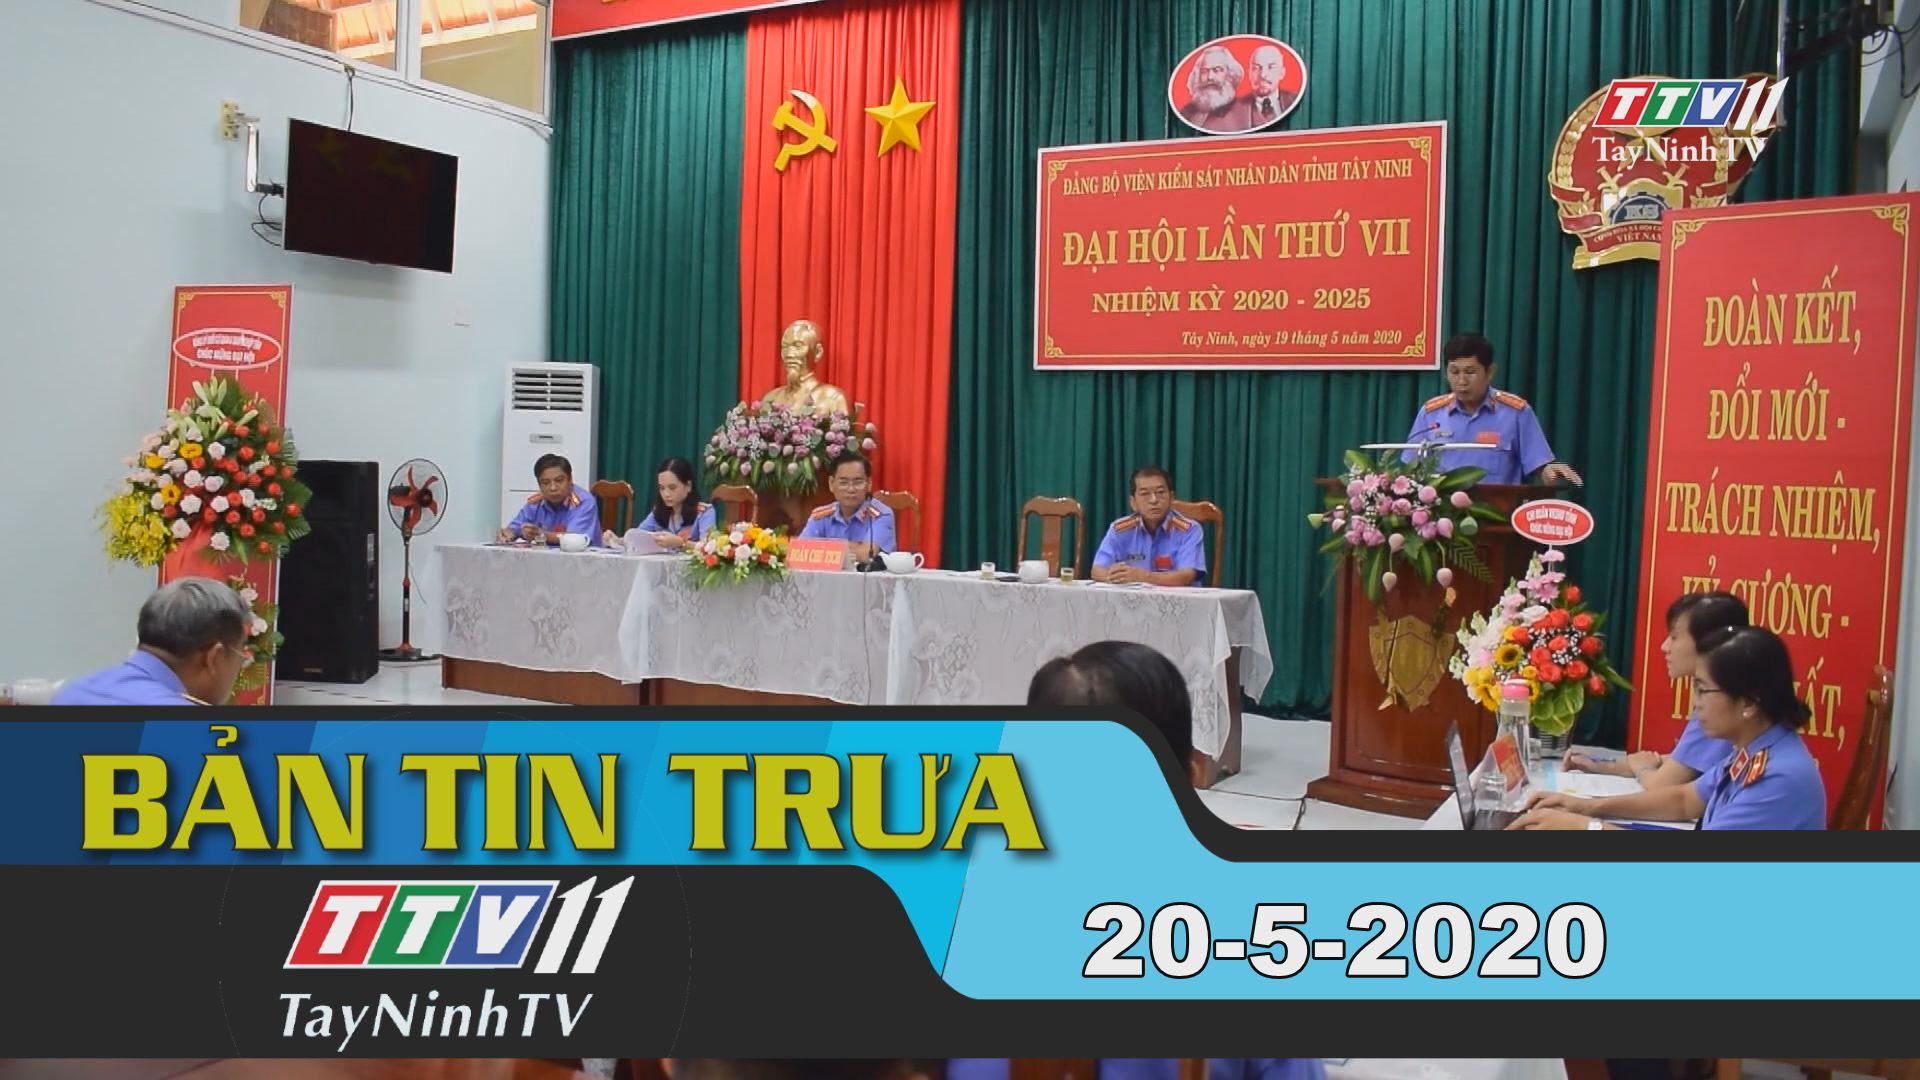 Bản tin trưa 20-5-2020 | Tin tức hôm nay | TayNinhTV